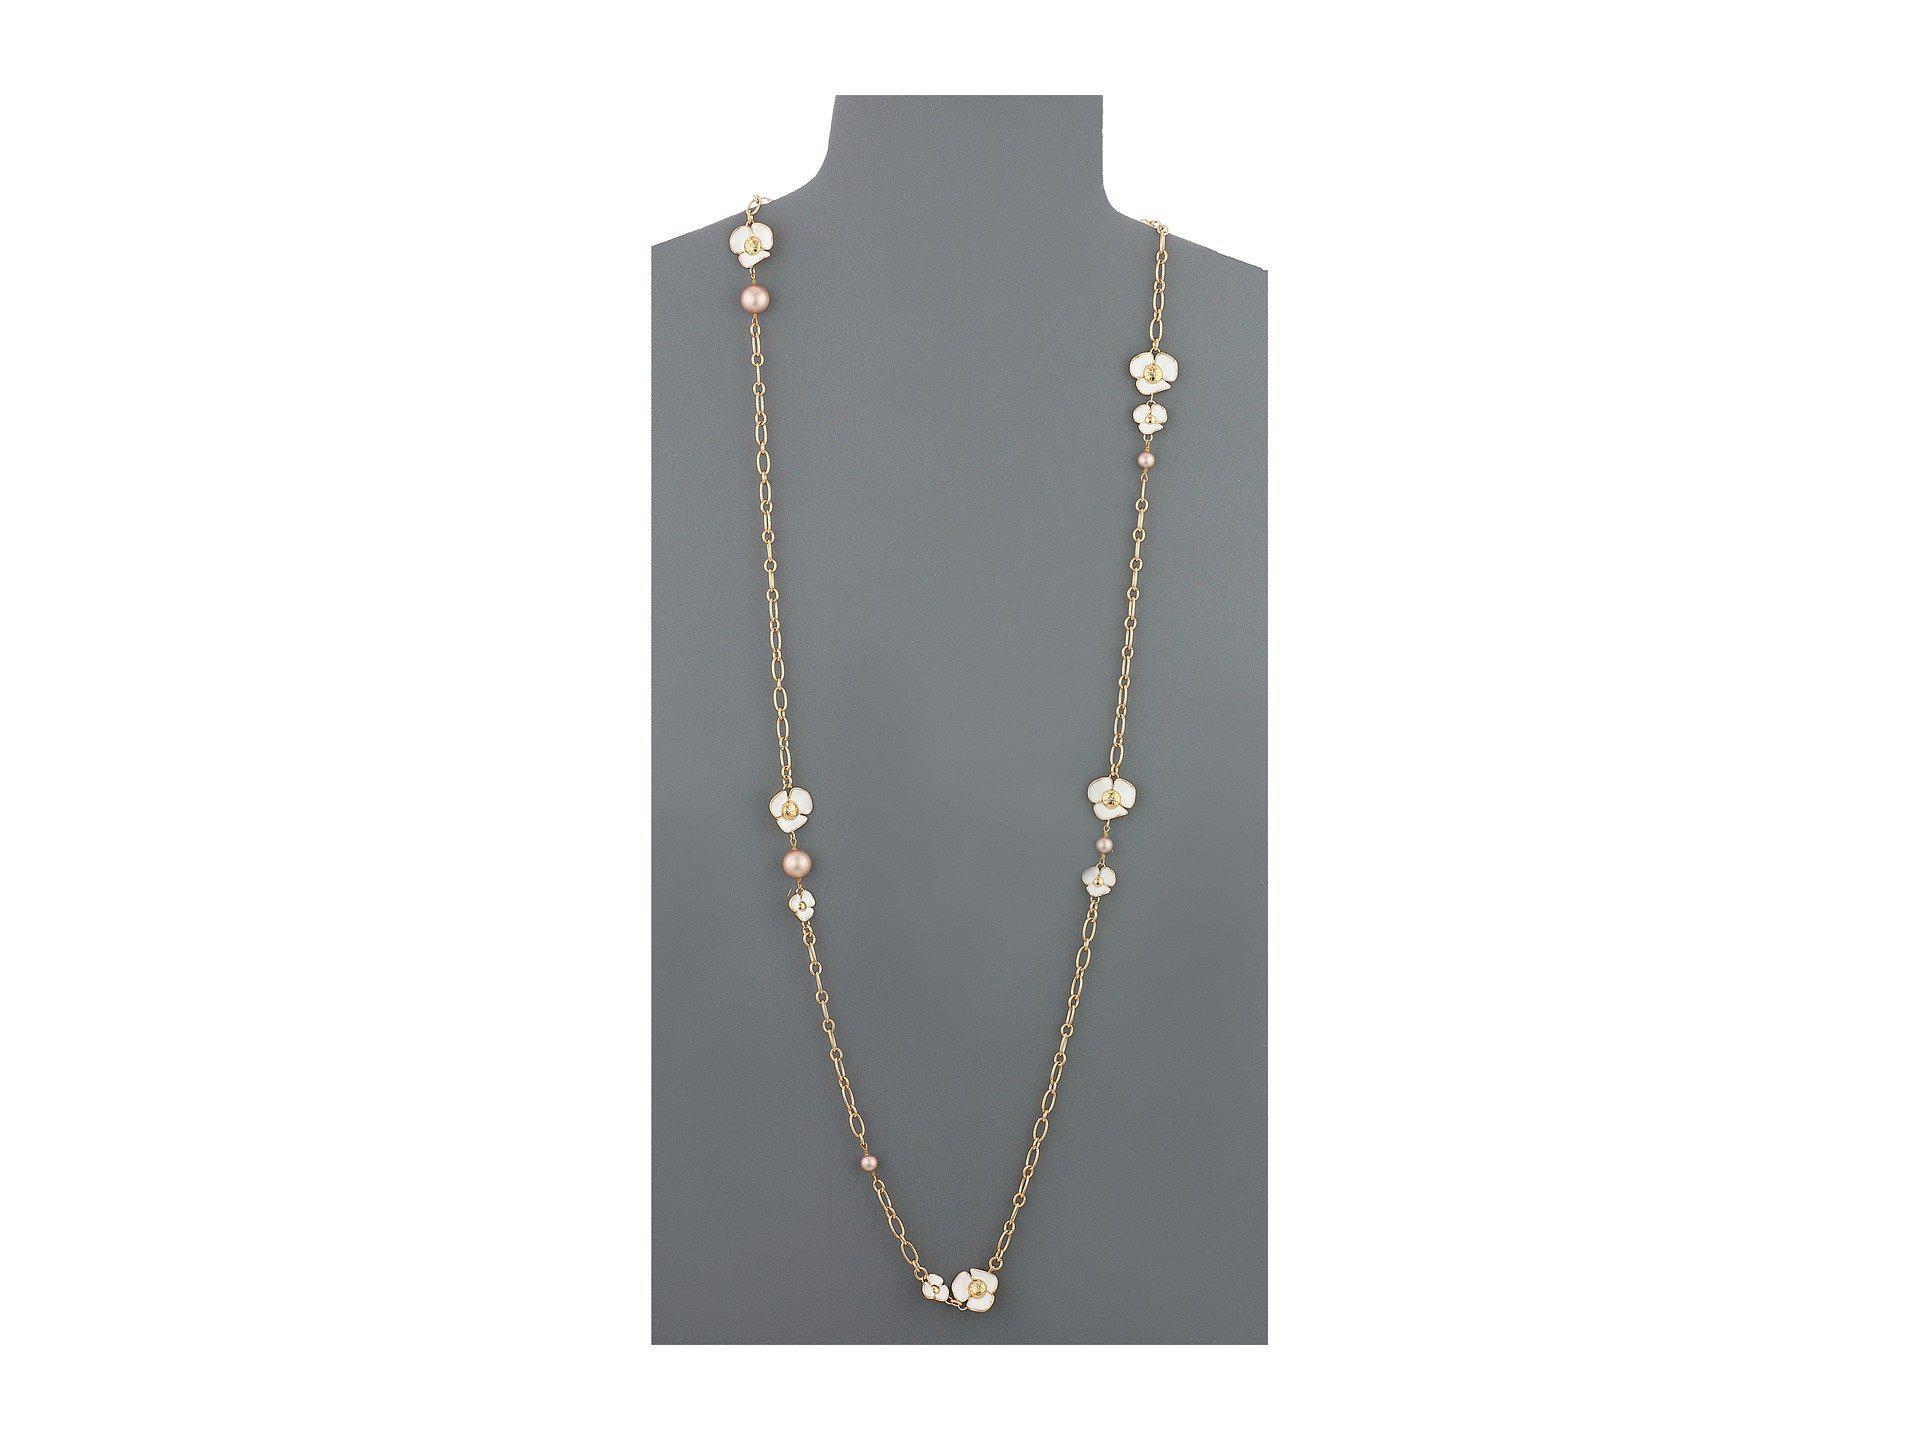 f6f38935454e Lyst - Tory Burch Fleur Rosary Necklace